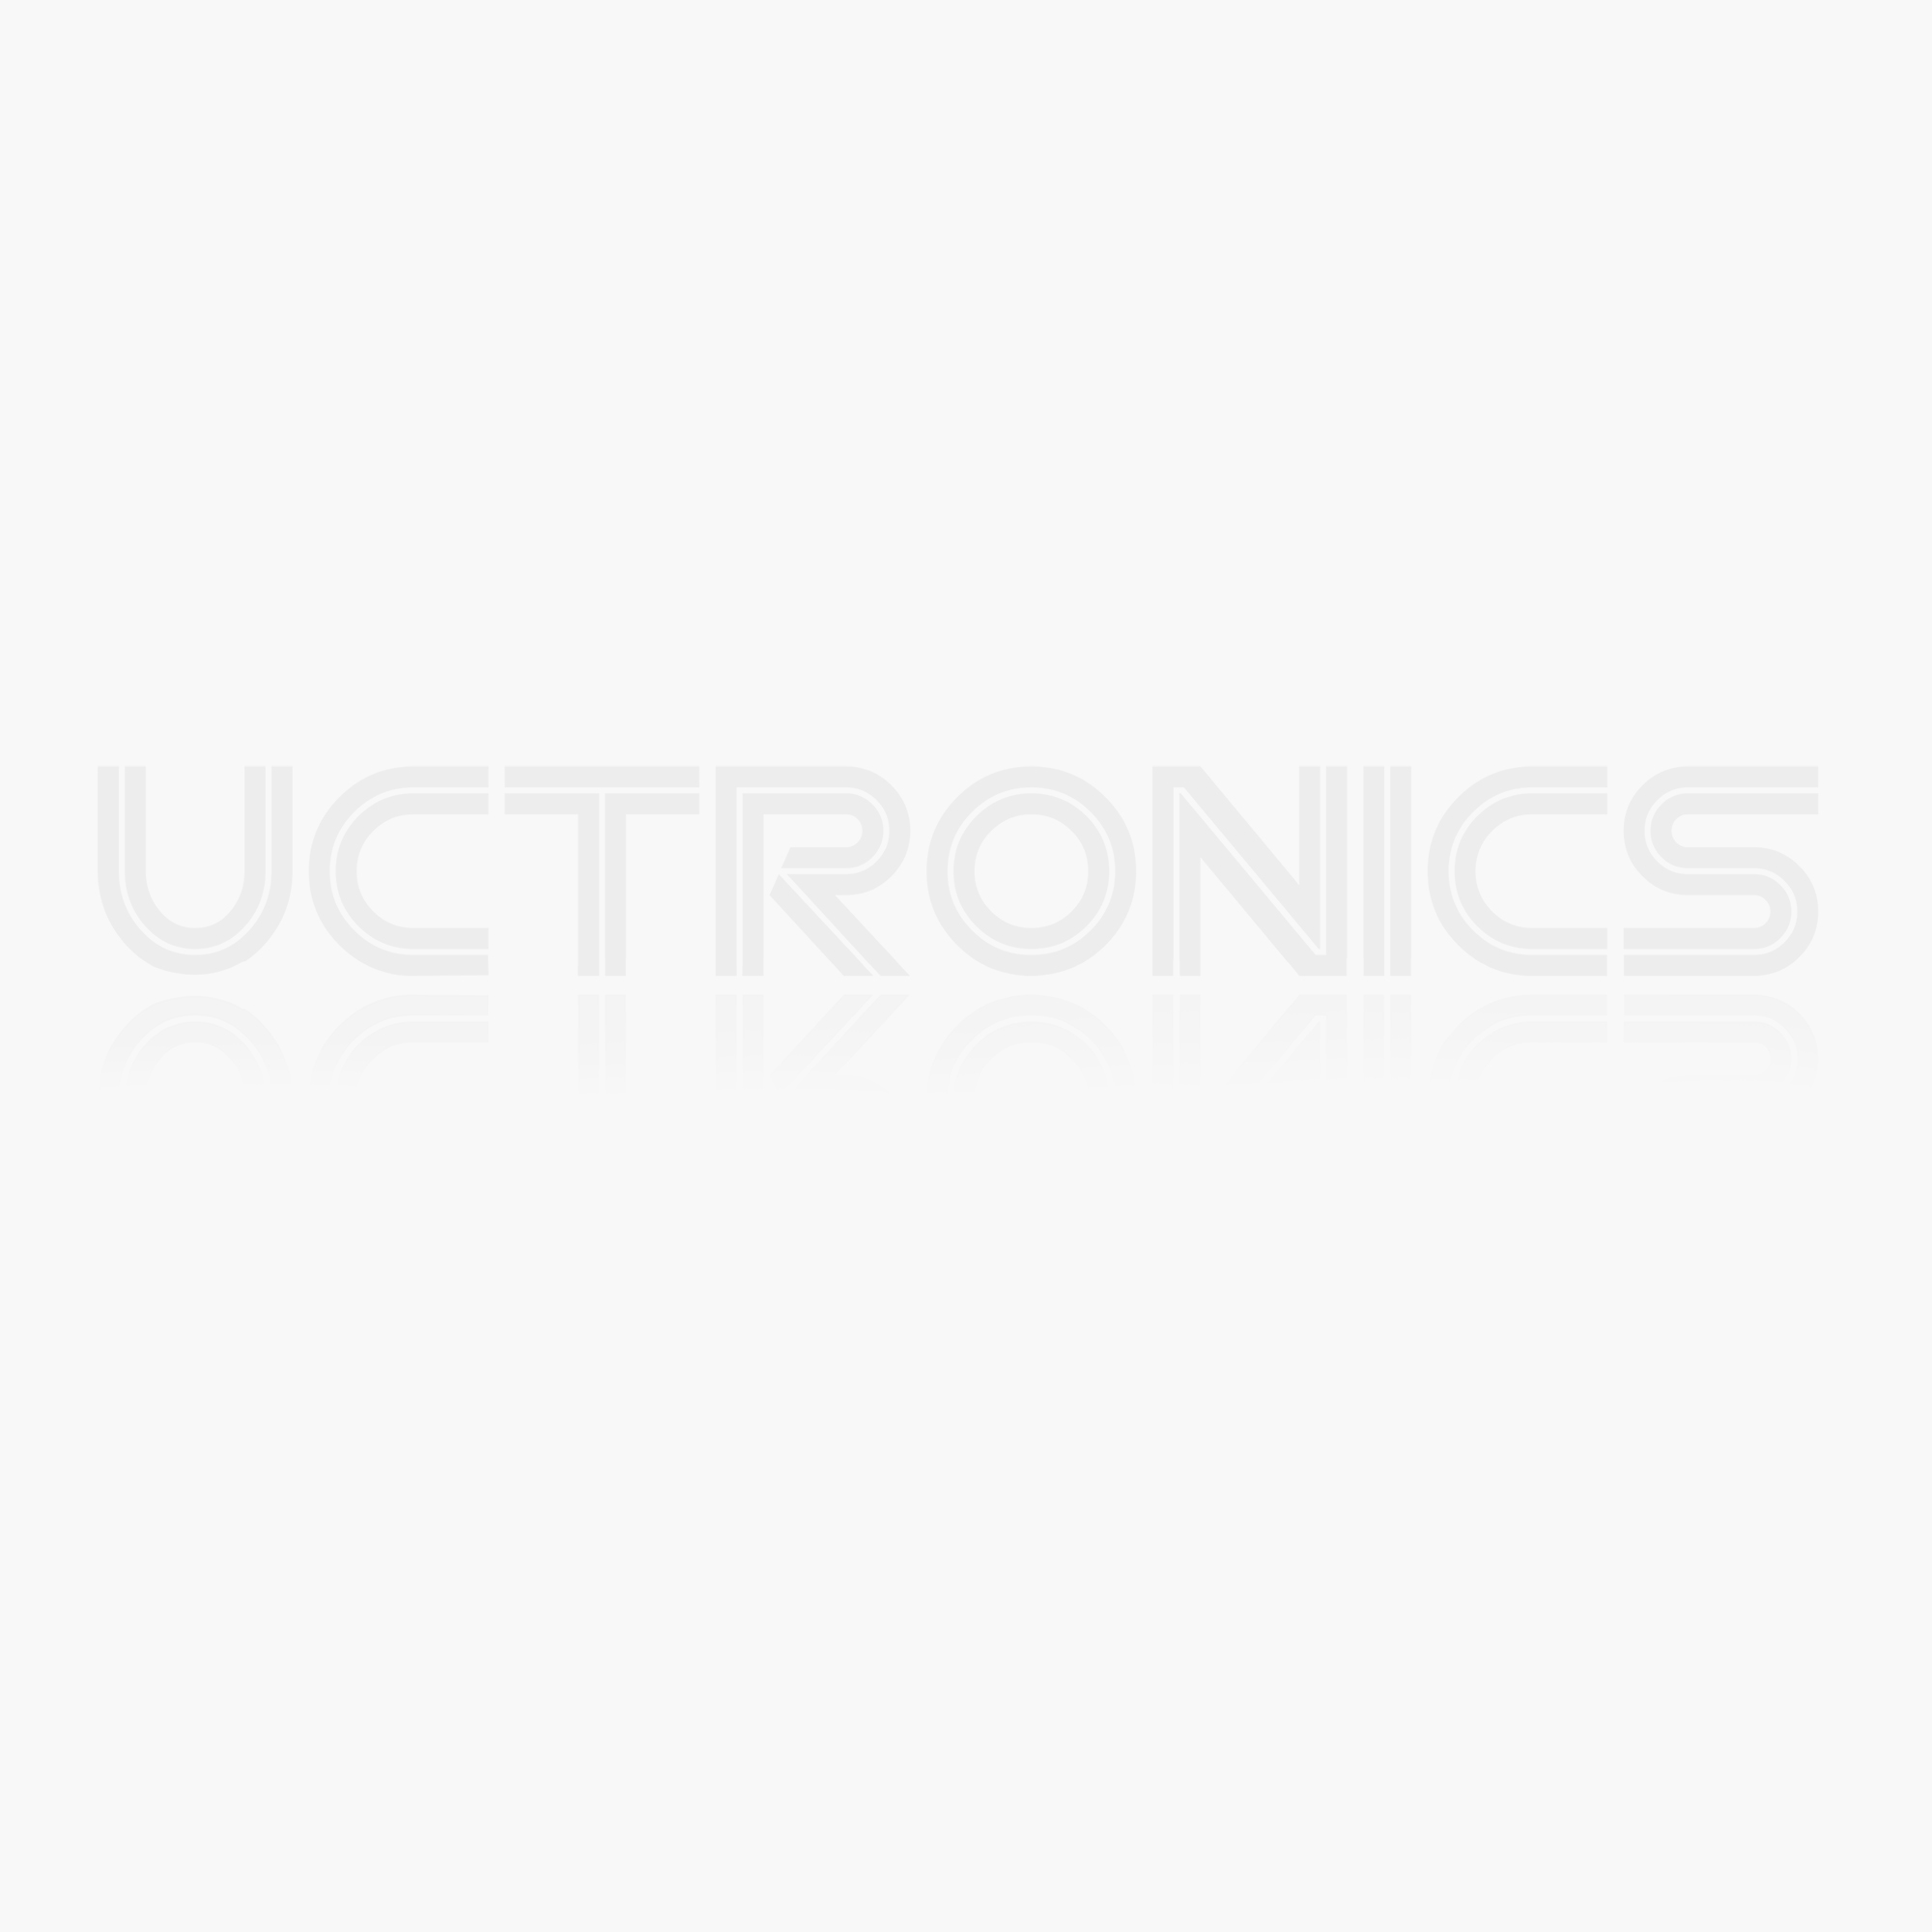 100pcs Tact Switch Button SMD Micro Switch 4x4x3.5mm